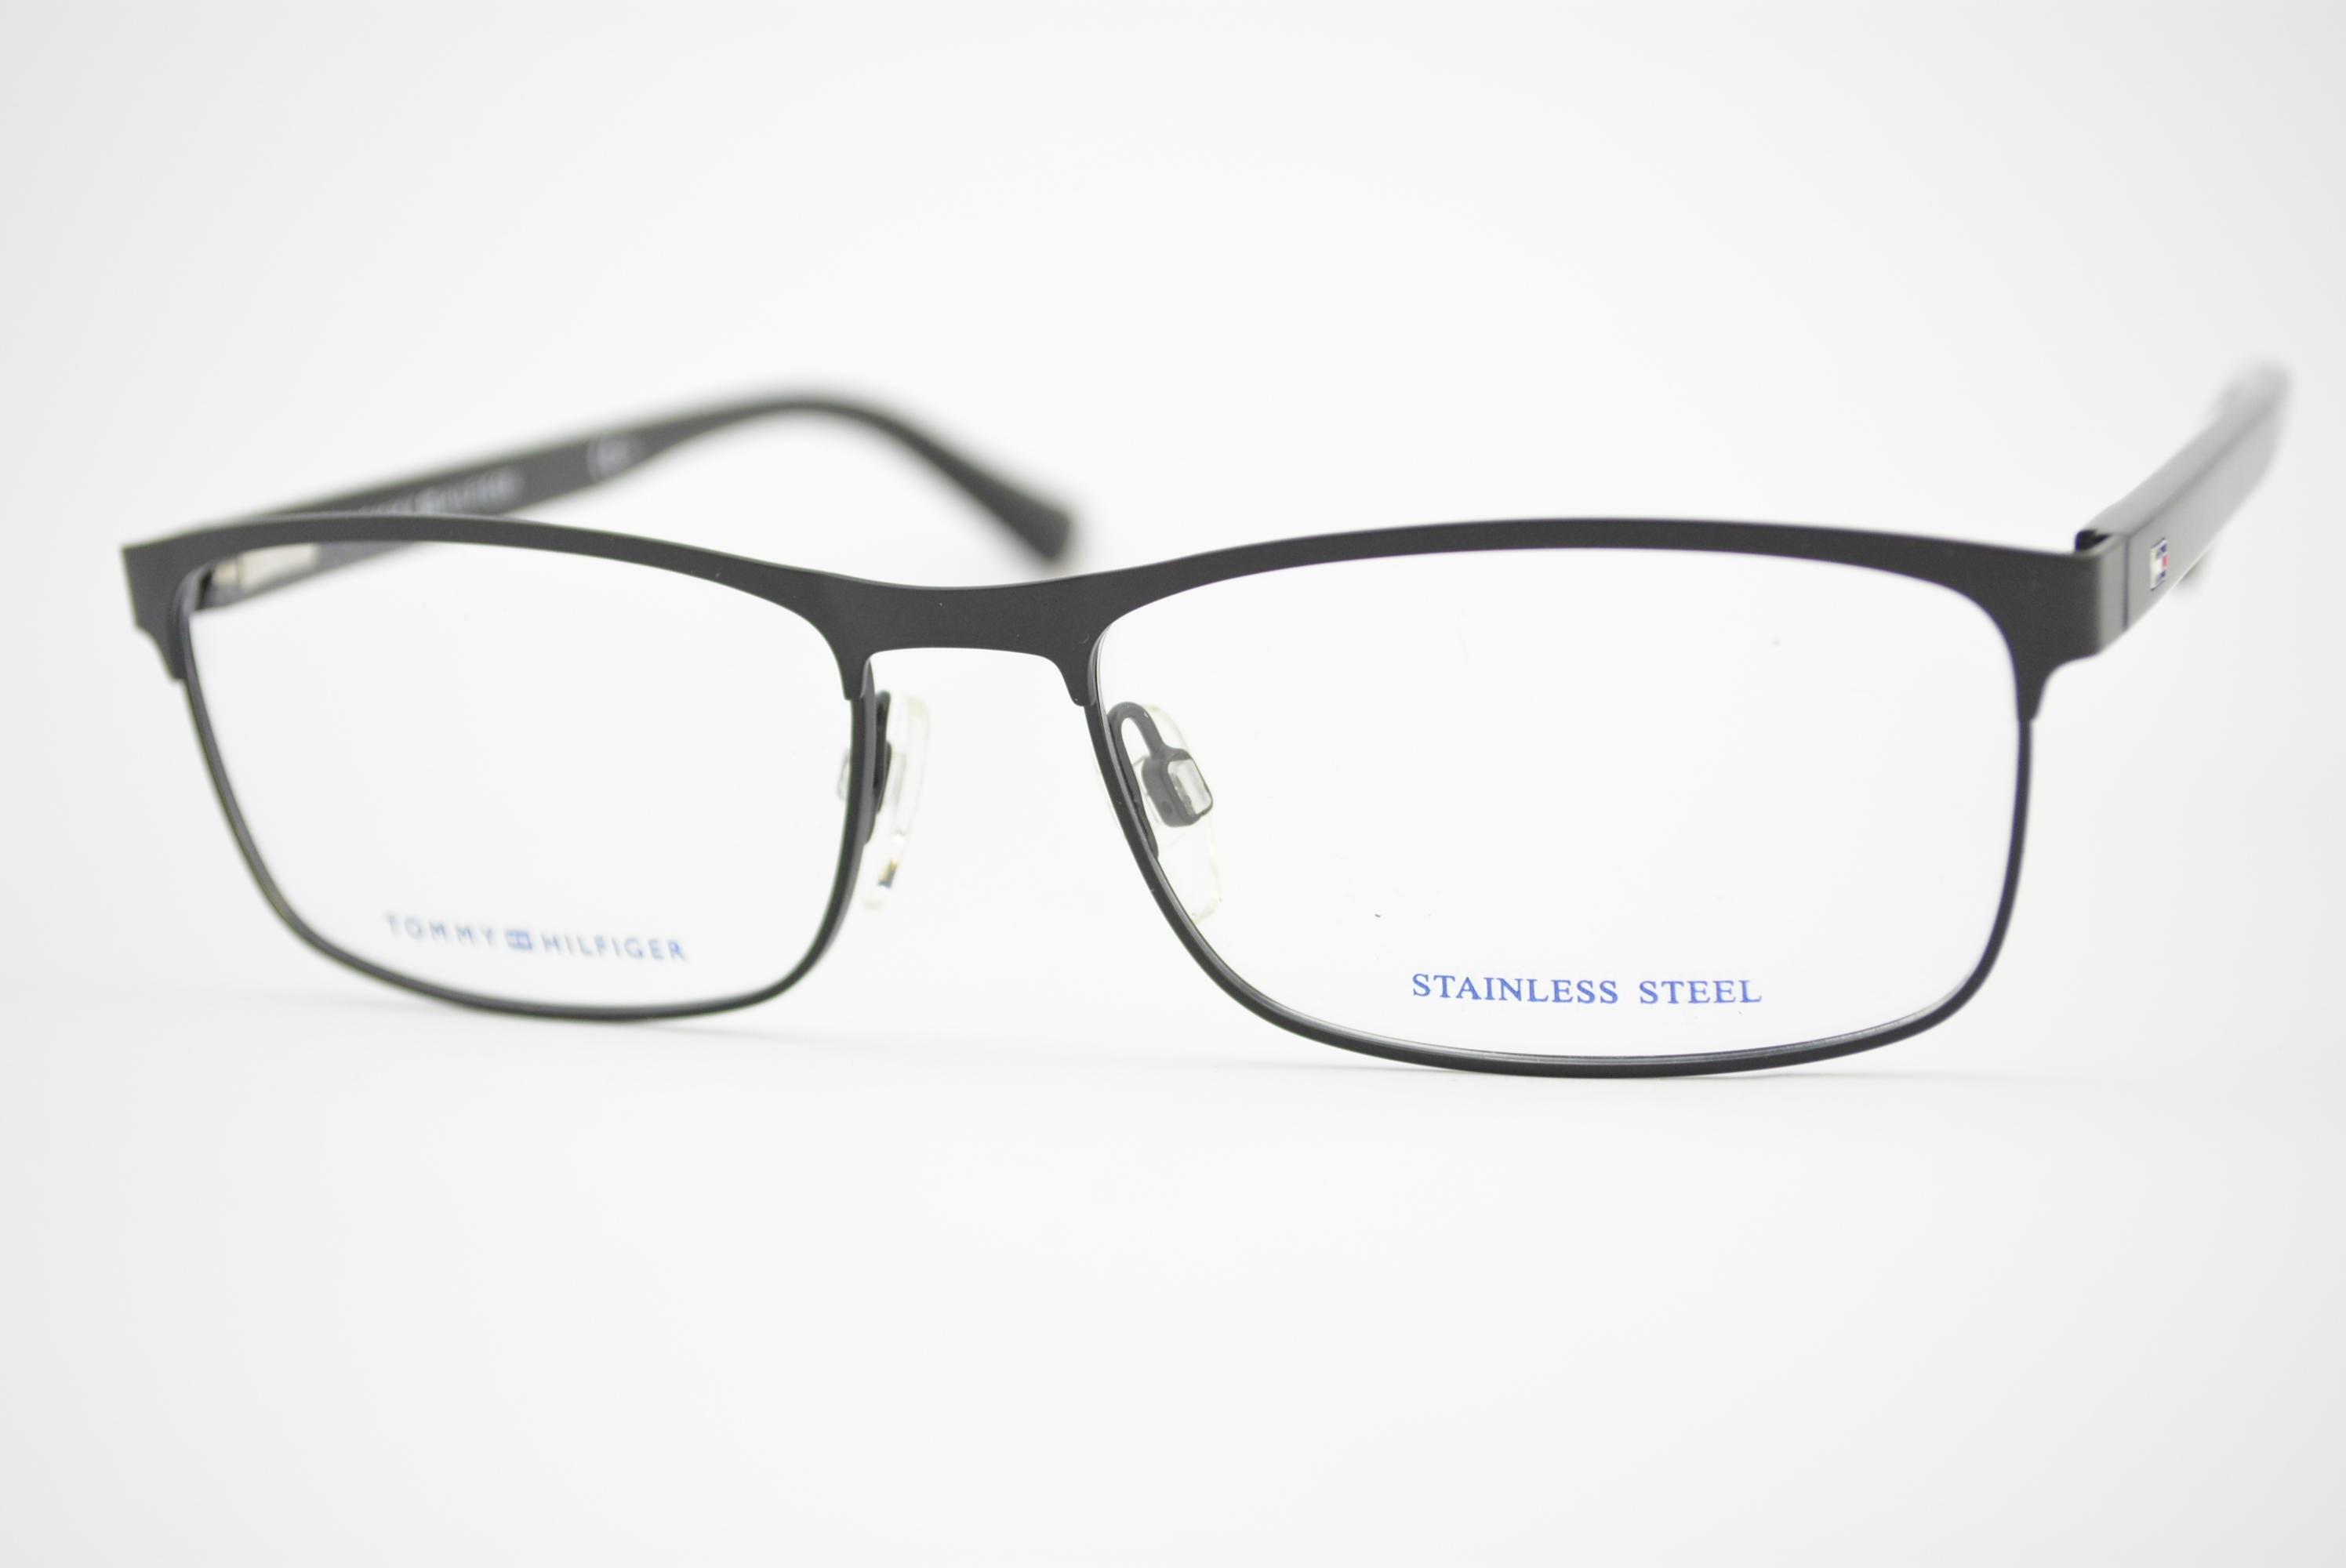 armação de óculos Tommy Hilfiger mod th1529 003